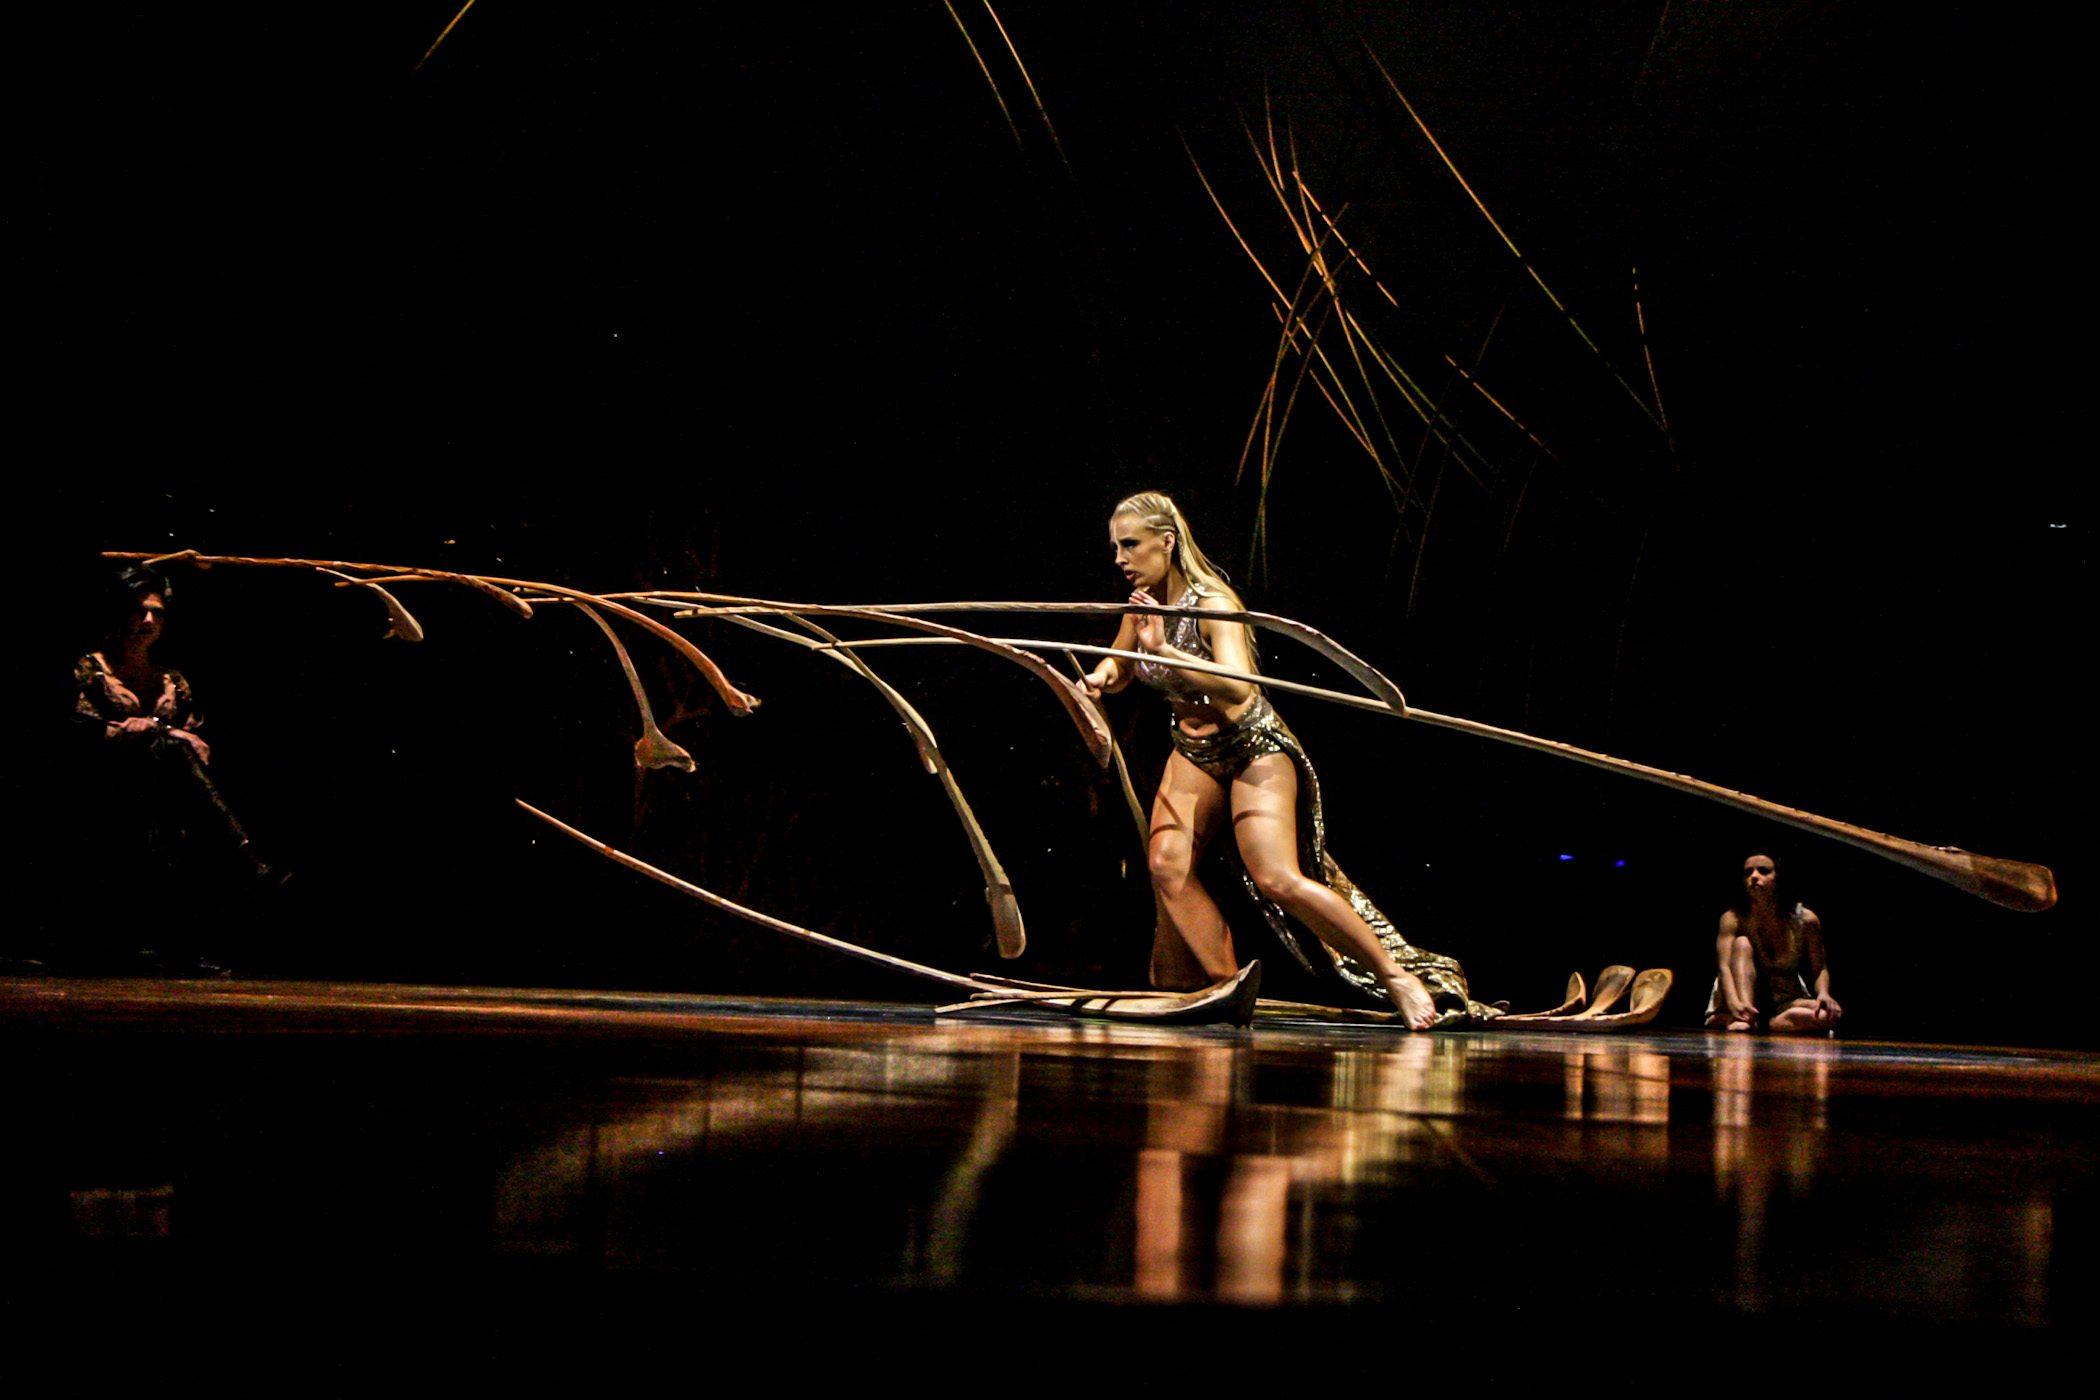 Image: Balance Goddess Lara Jacobs